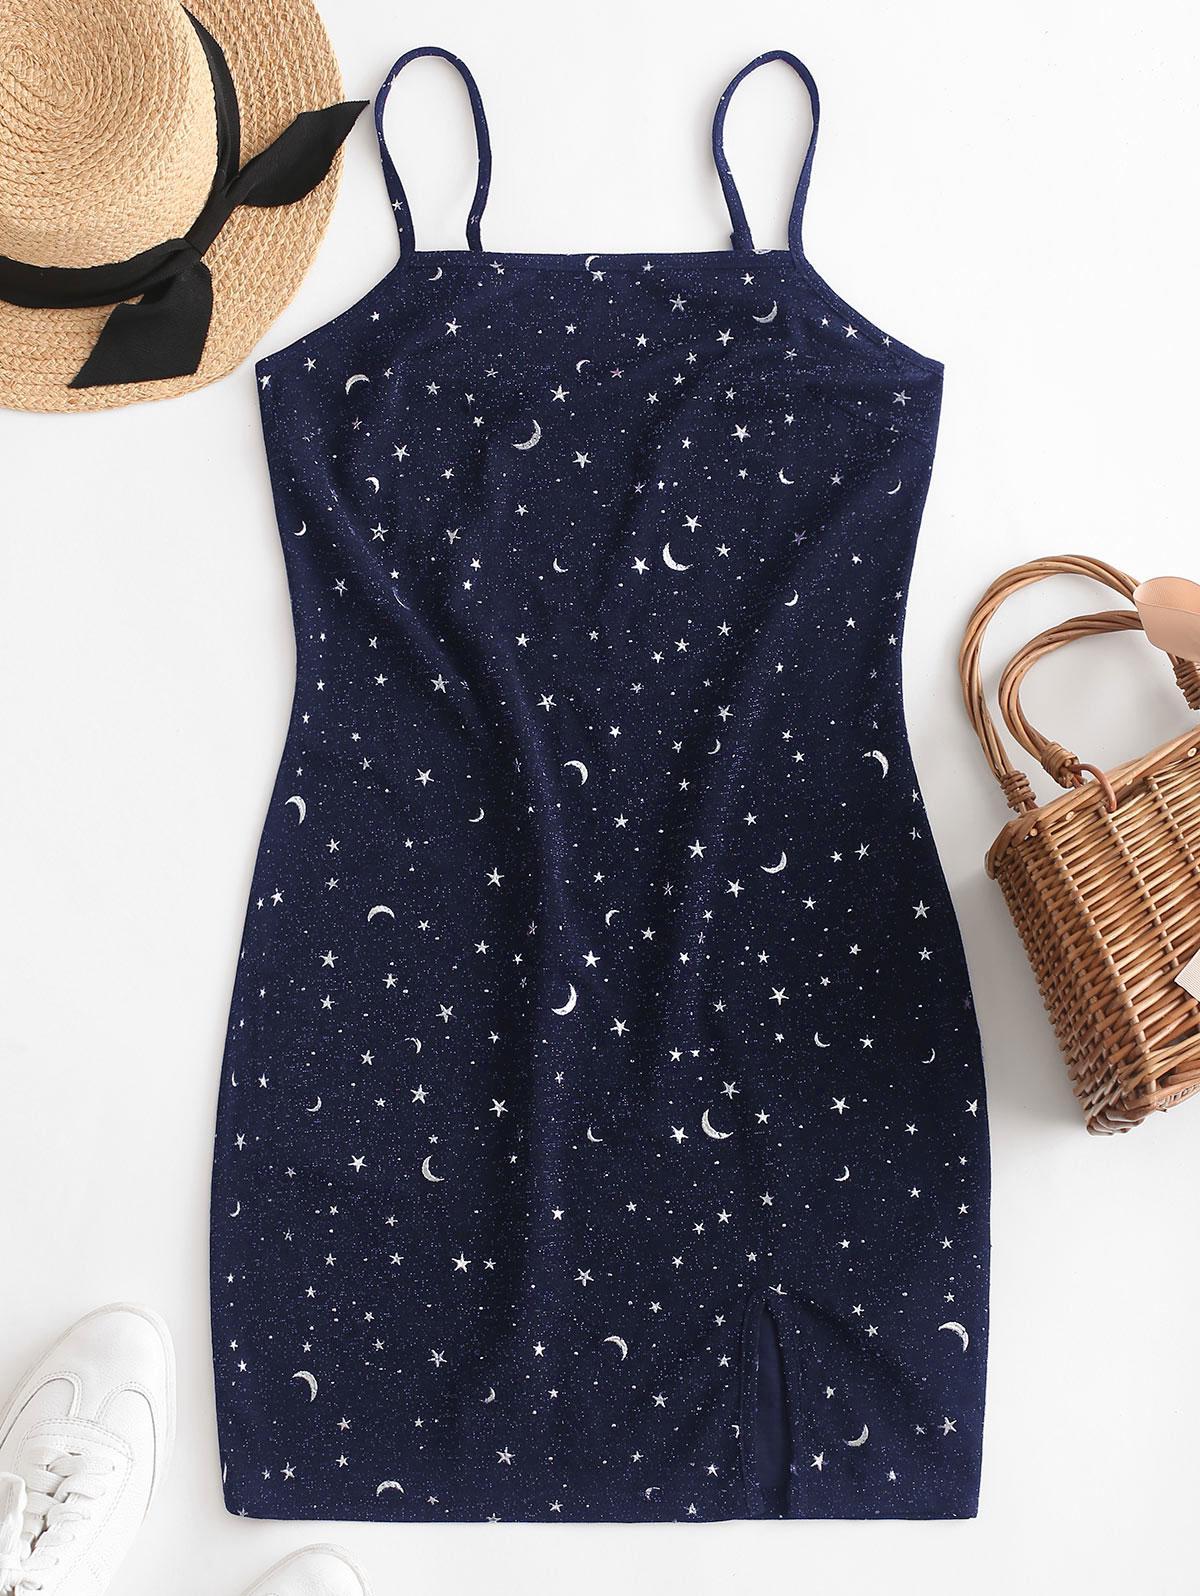 ZAFUL Moon and Star Metallic Thread Cami Slit Dress